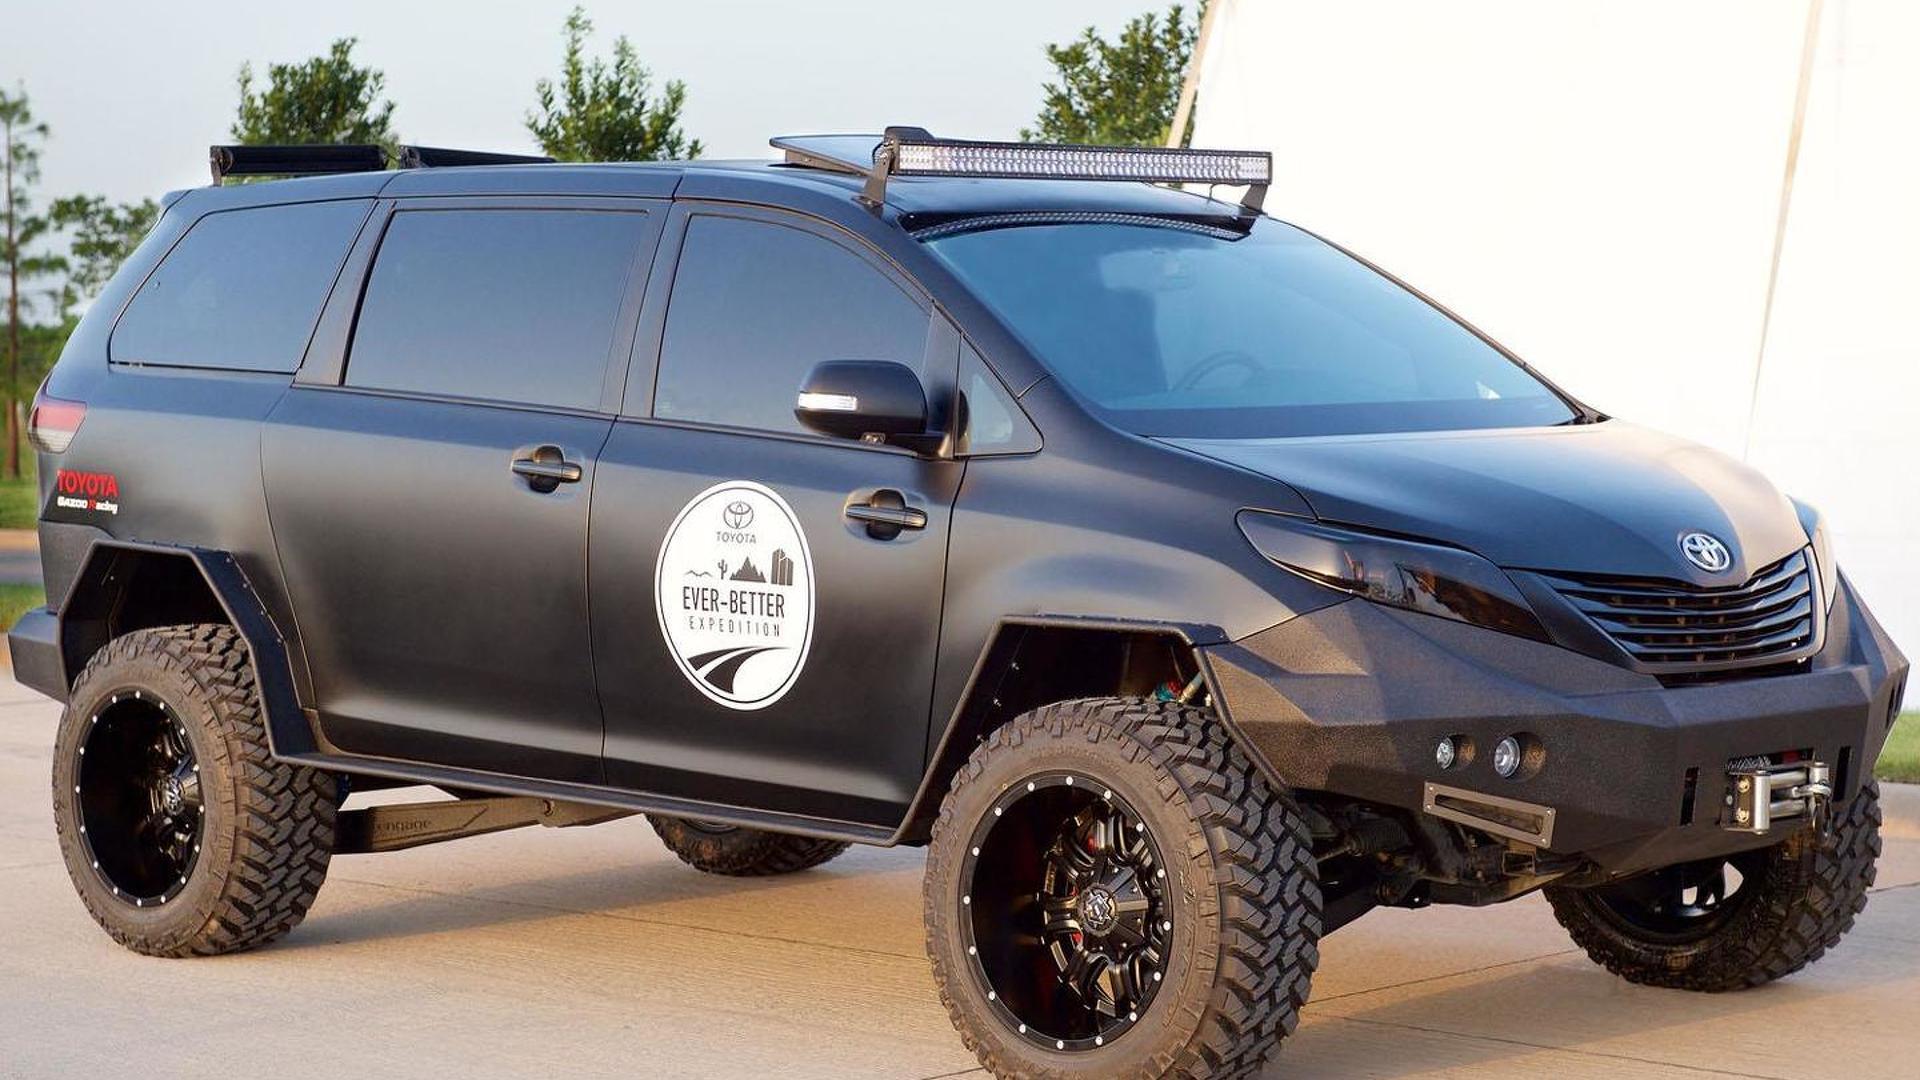 Toyota bringing 14 new models to SEMA